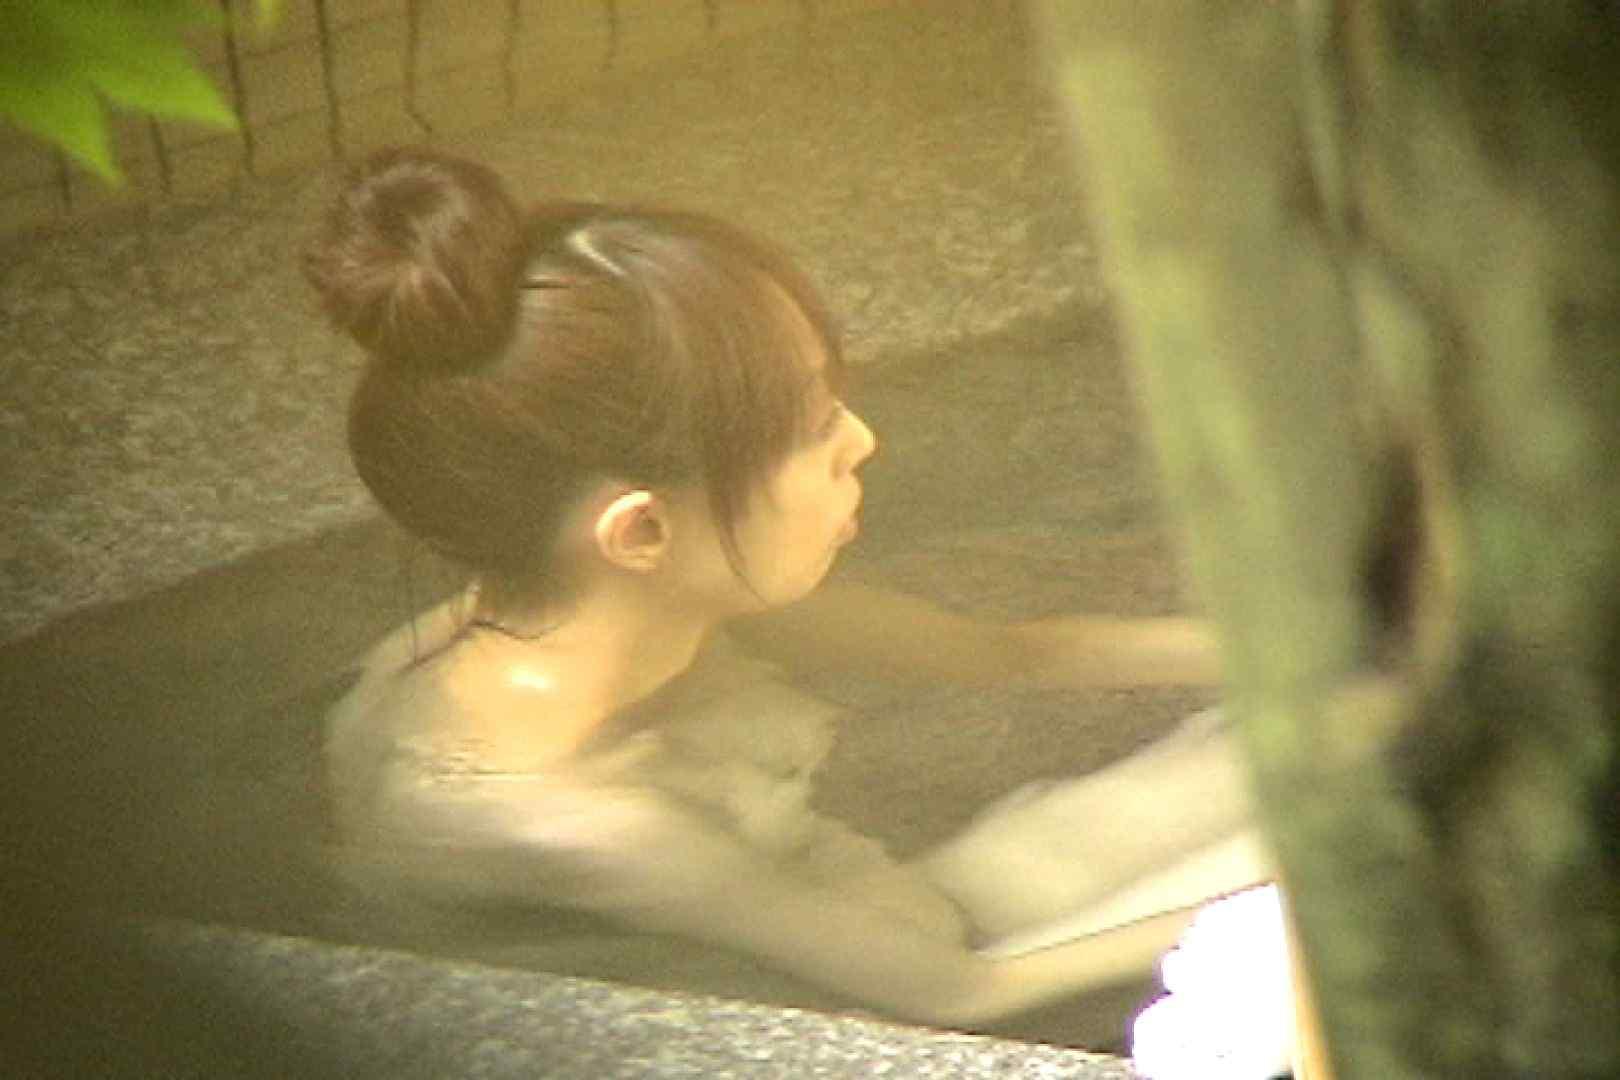 No.16 細身妊婦の膨らんだお腹とオッパイ 露天入浴 オマンコ無修正動画無料 91枚 43